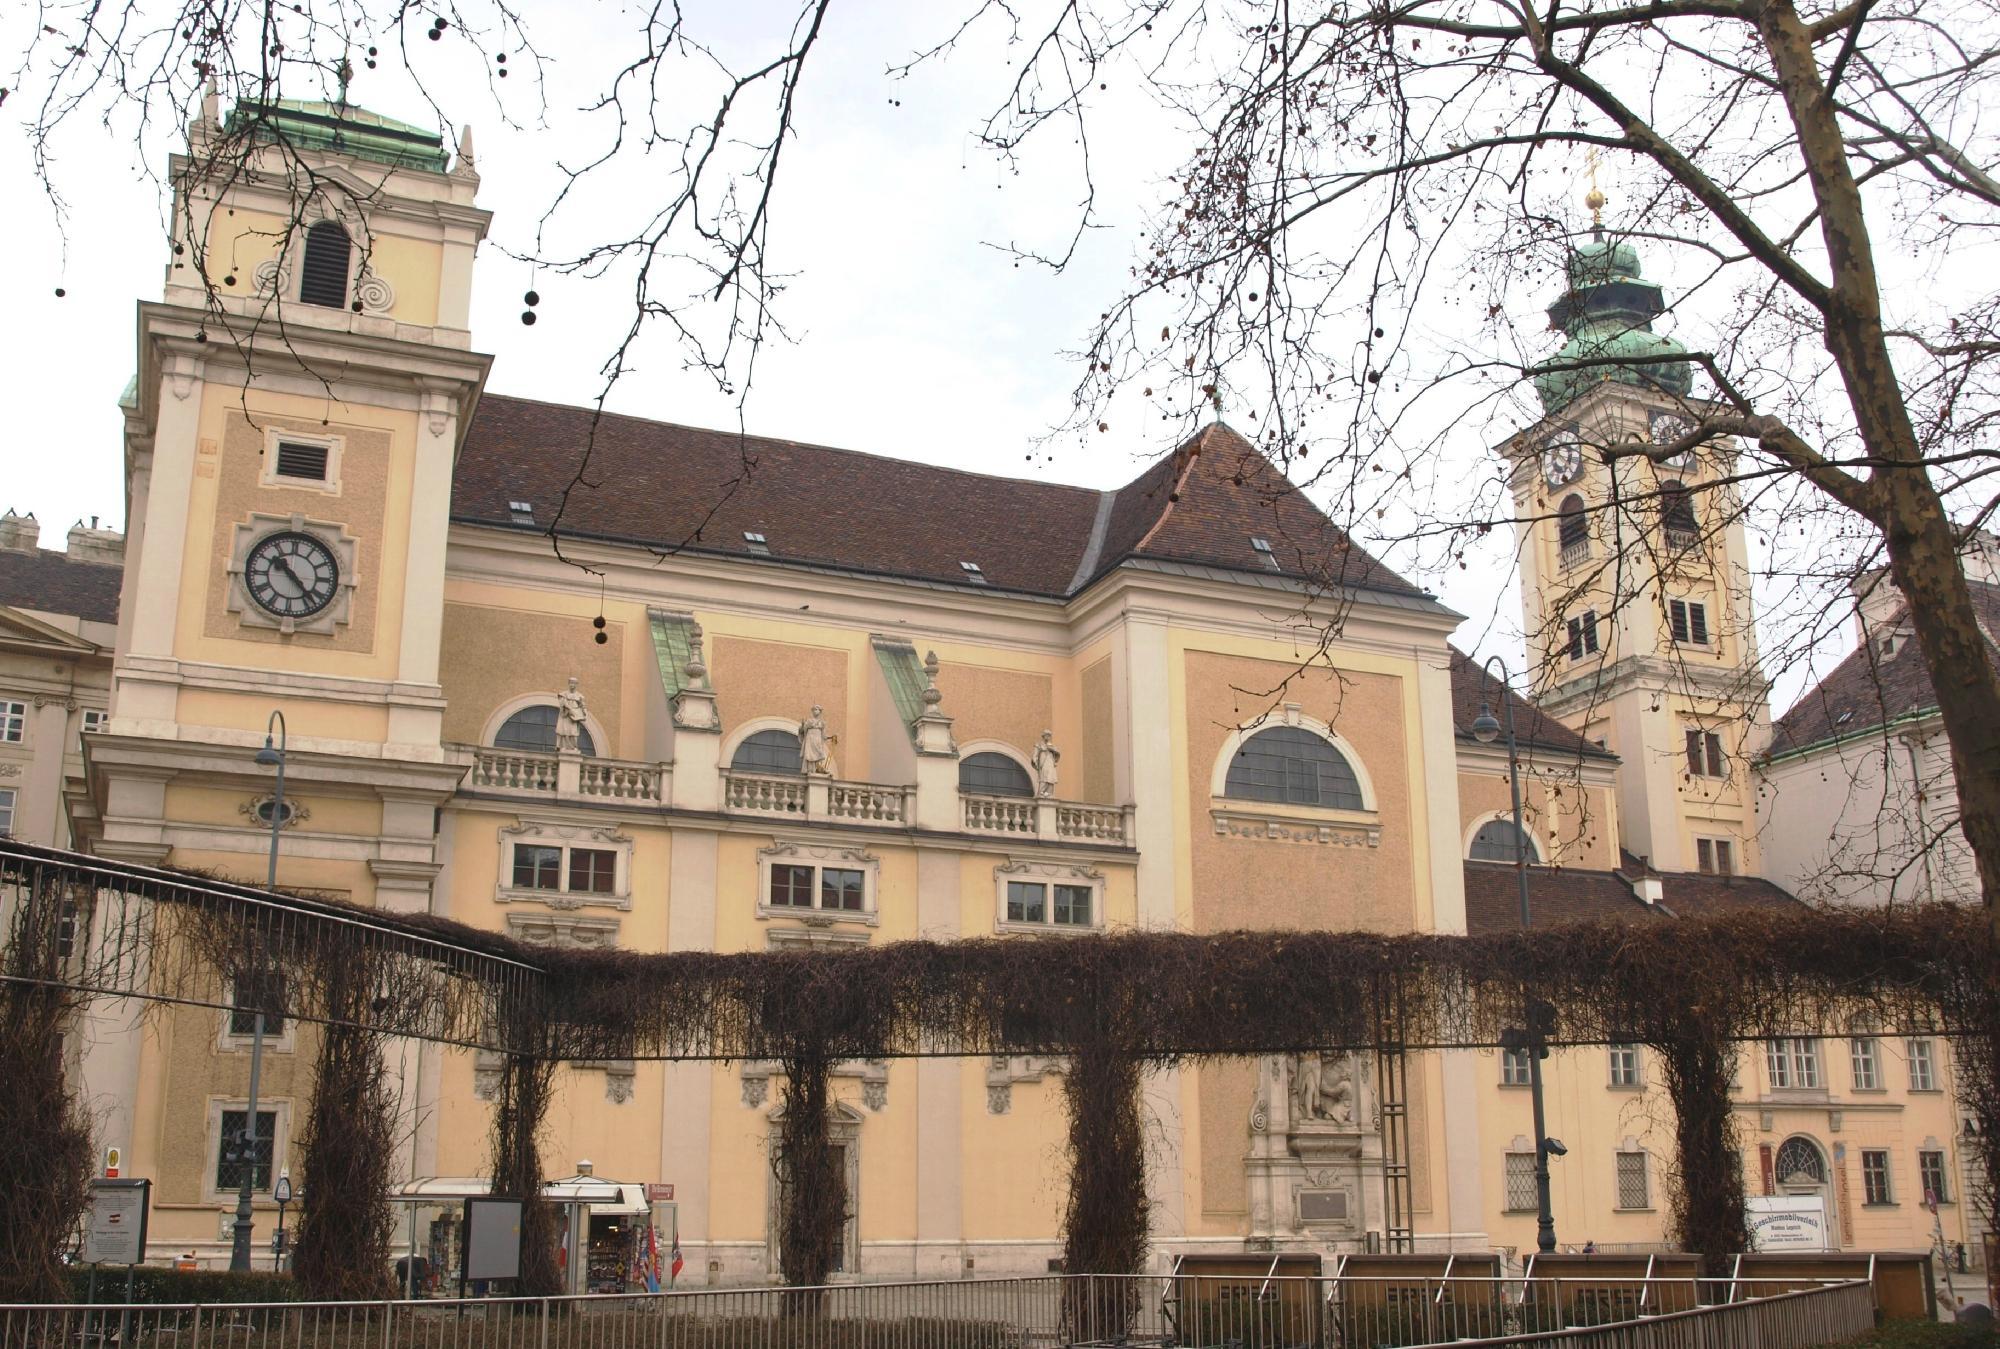 Benediktushaus Guest House